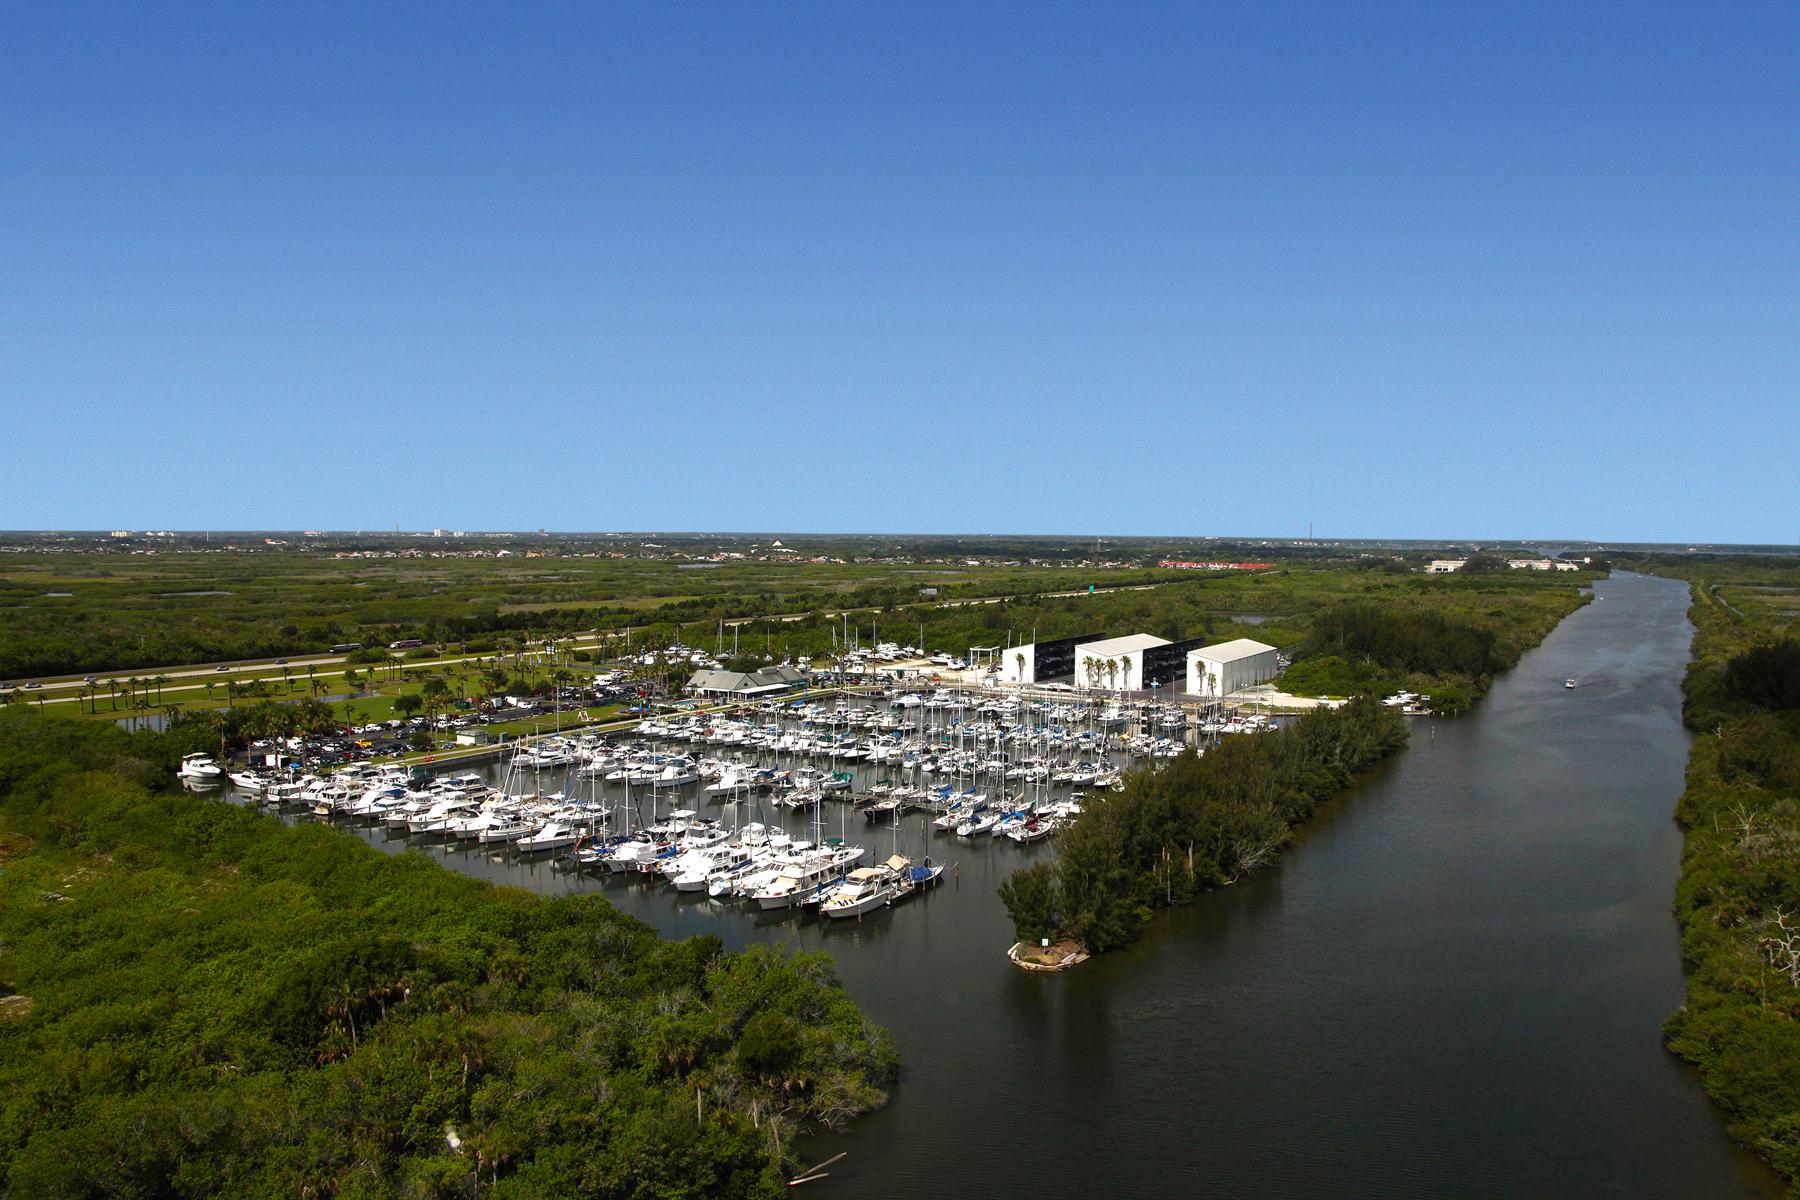 Harbortown Marina Merritt Island - Port Canaveral